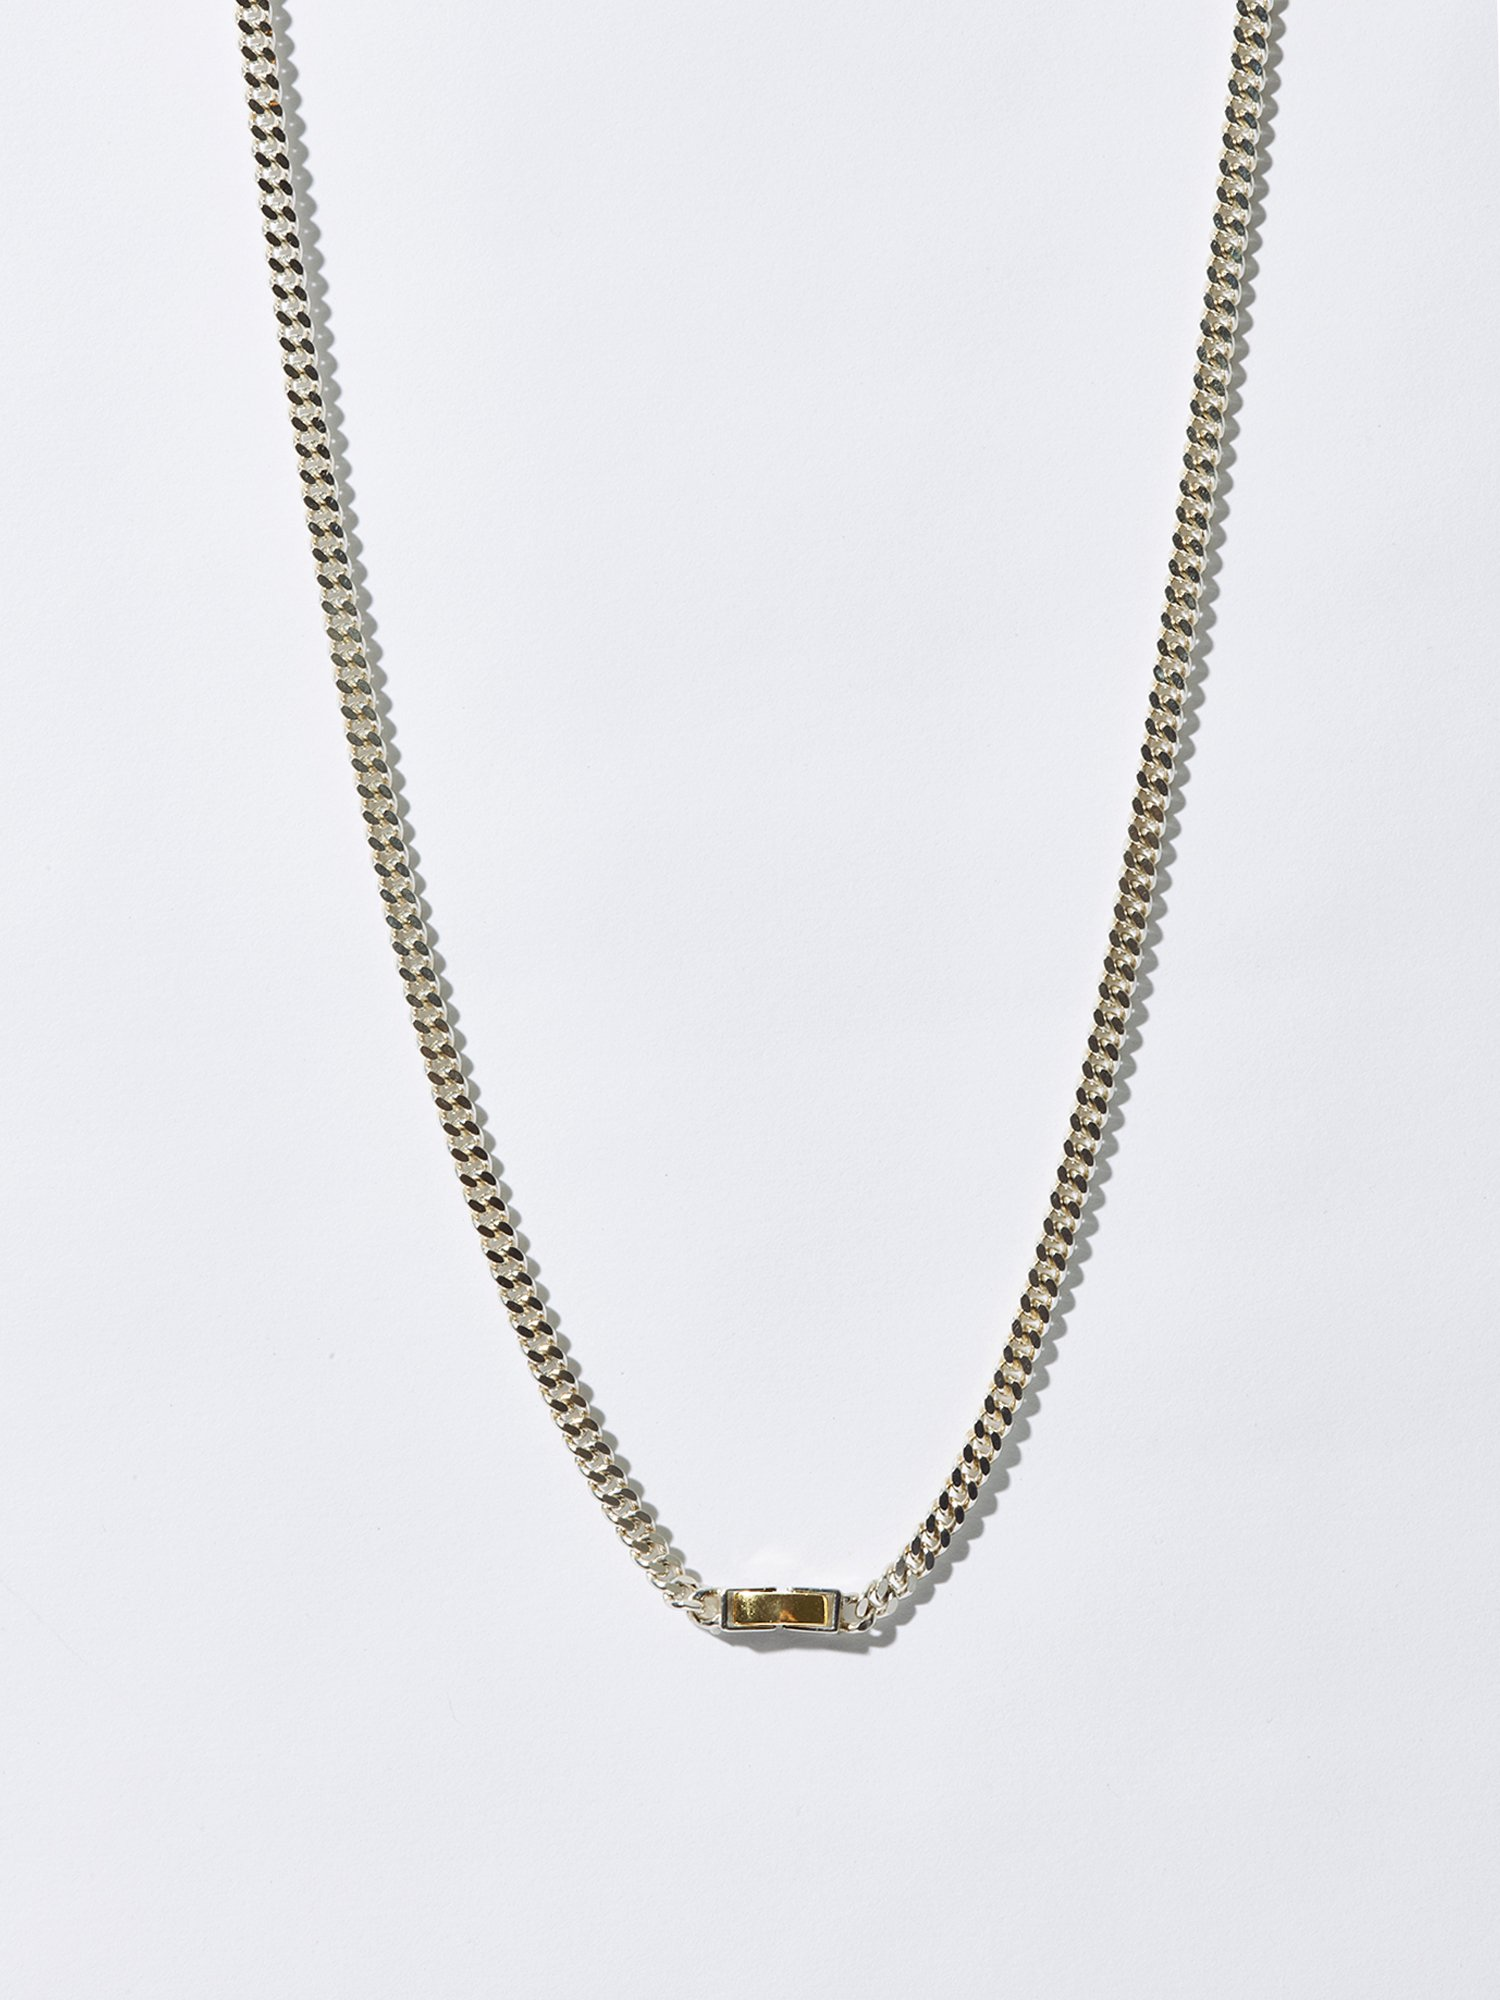 ARTEMIS / Tiny gourmette necklace